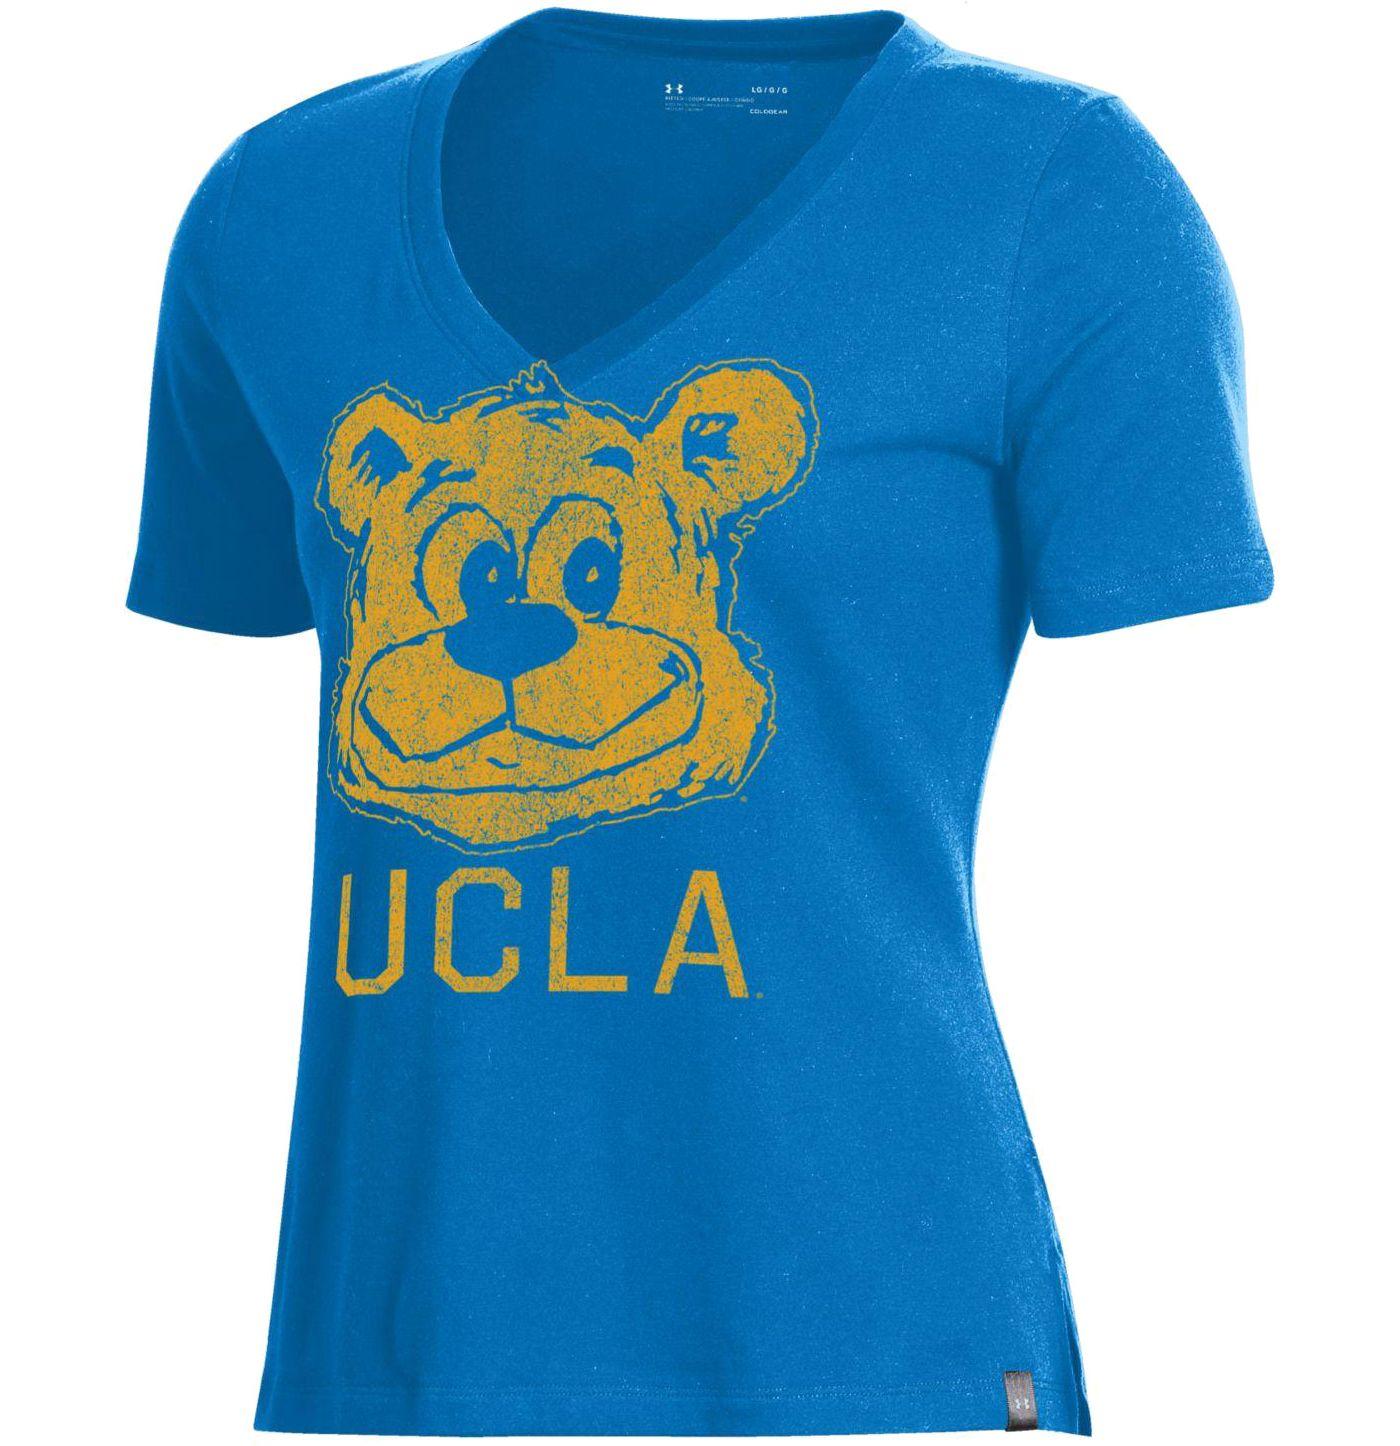 Under Armour Women's UCLA Bruins True Blue Performance V-Neck T-Shirt